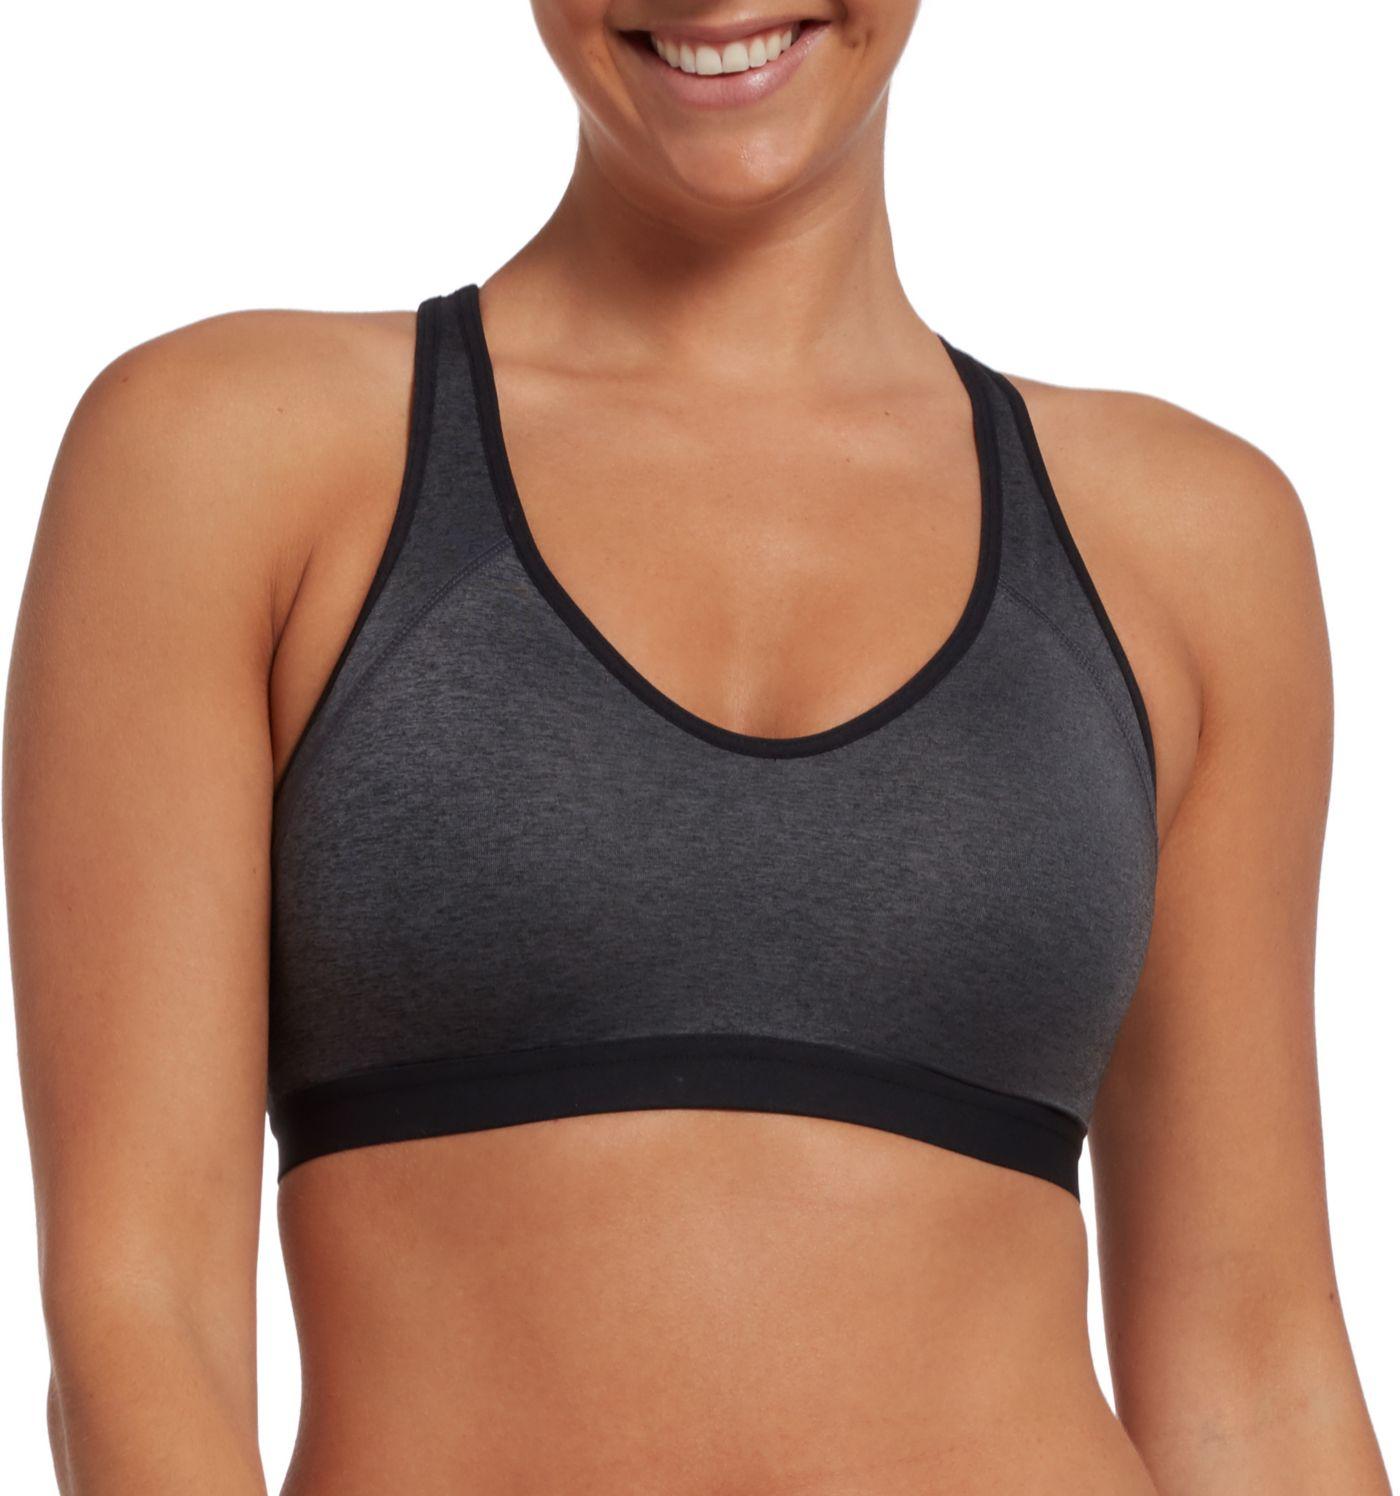 DSG Women's Adjustable High Support Sports Bra